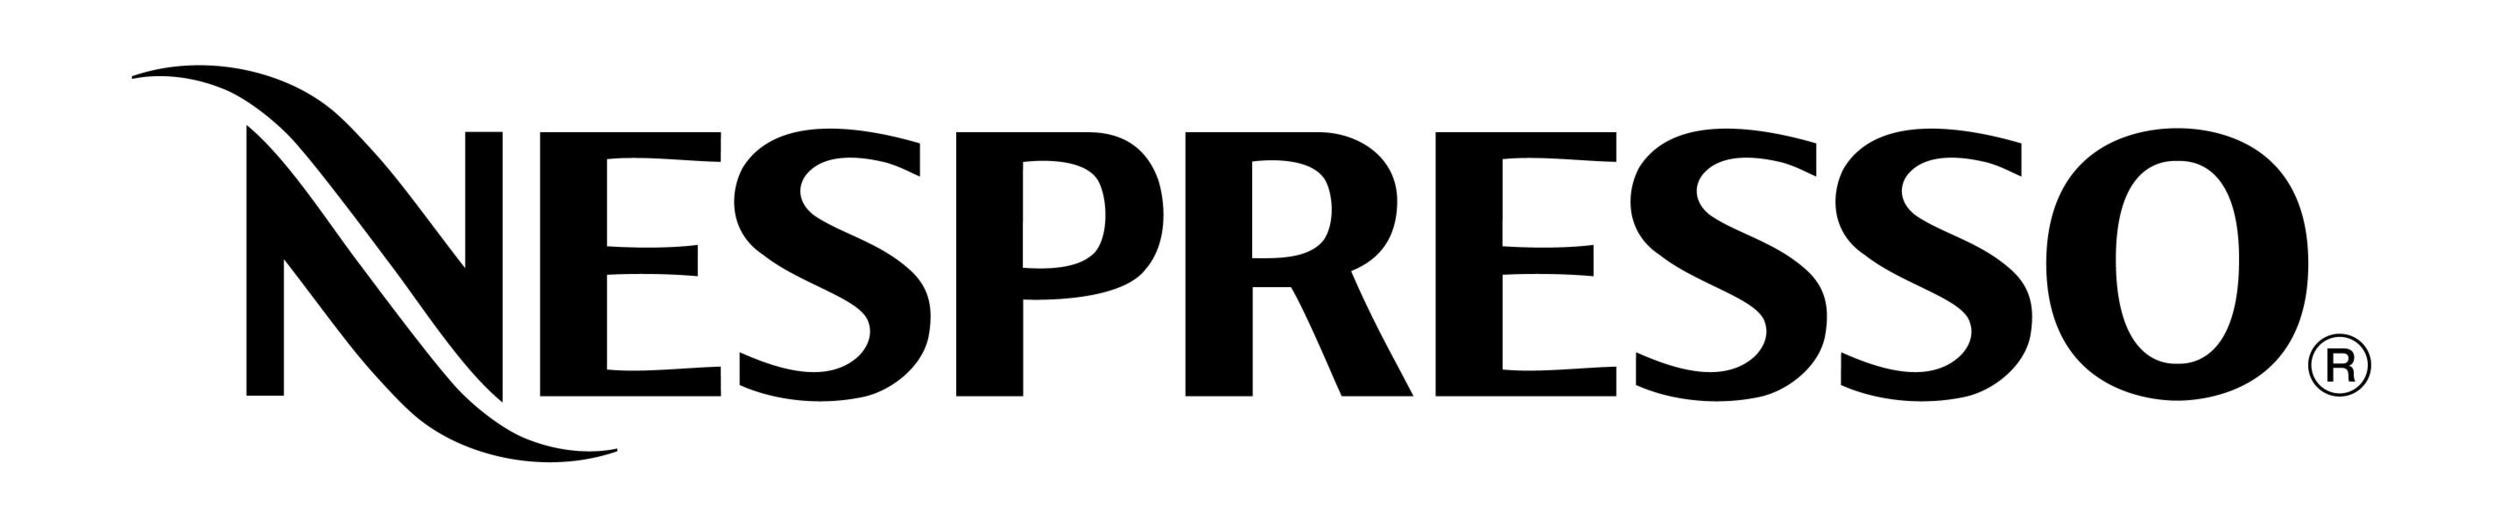 nespresso_logo_5e05074f_9b00_4668_b529_371a0625f266.png